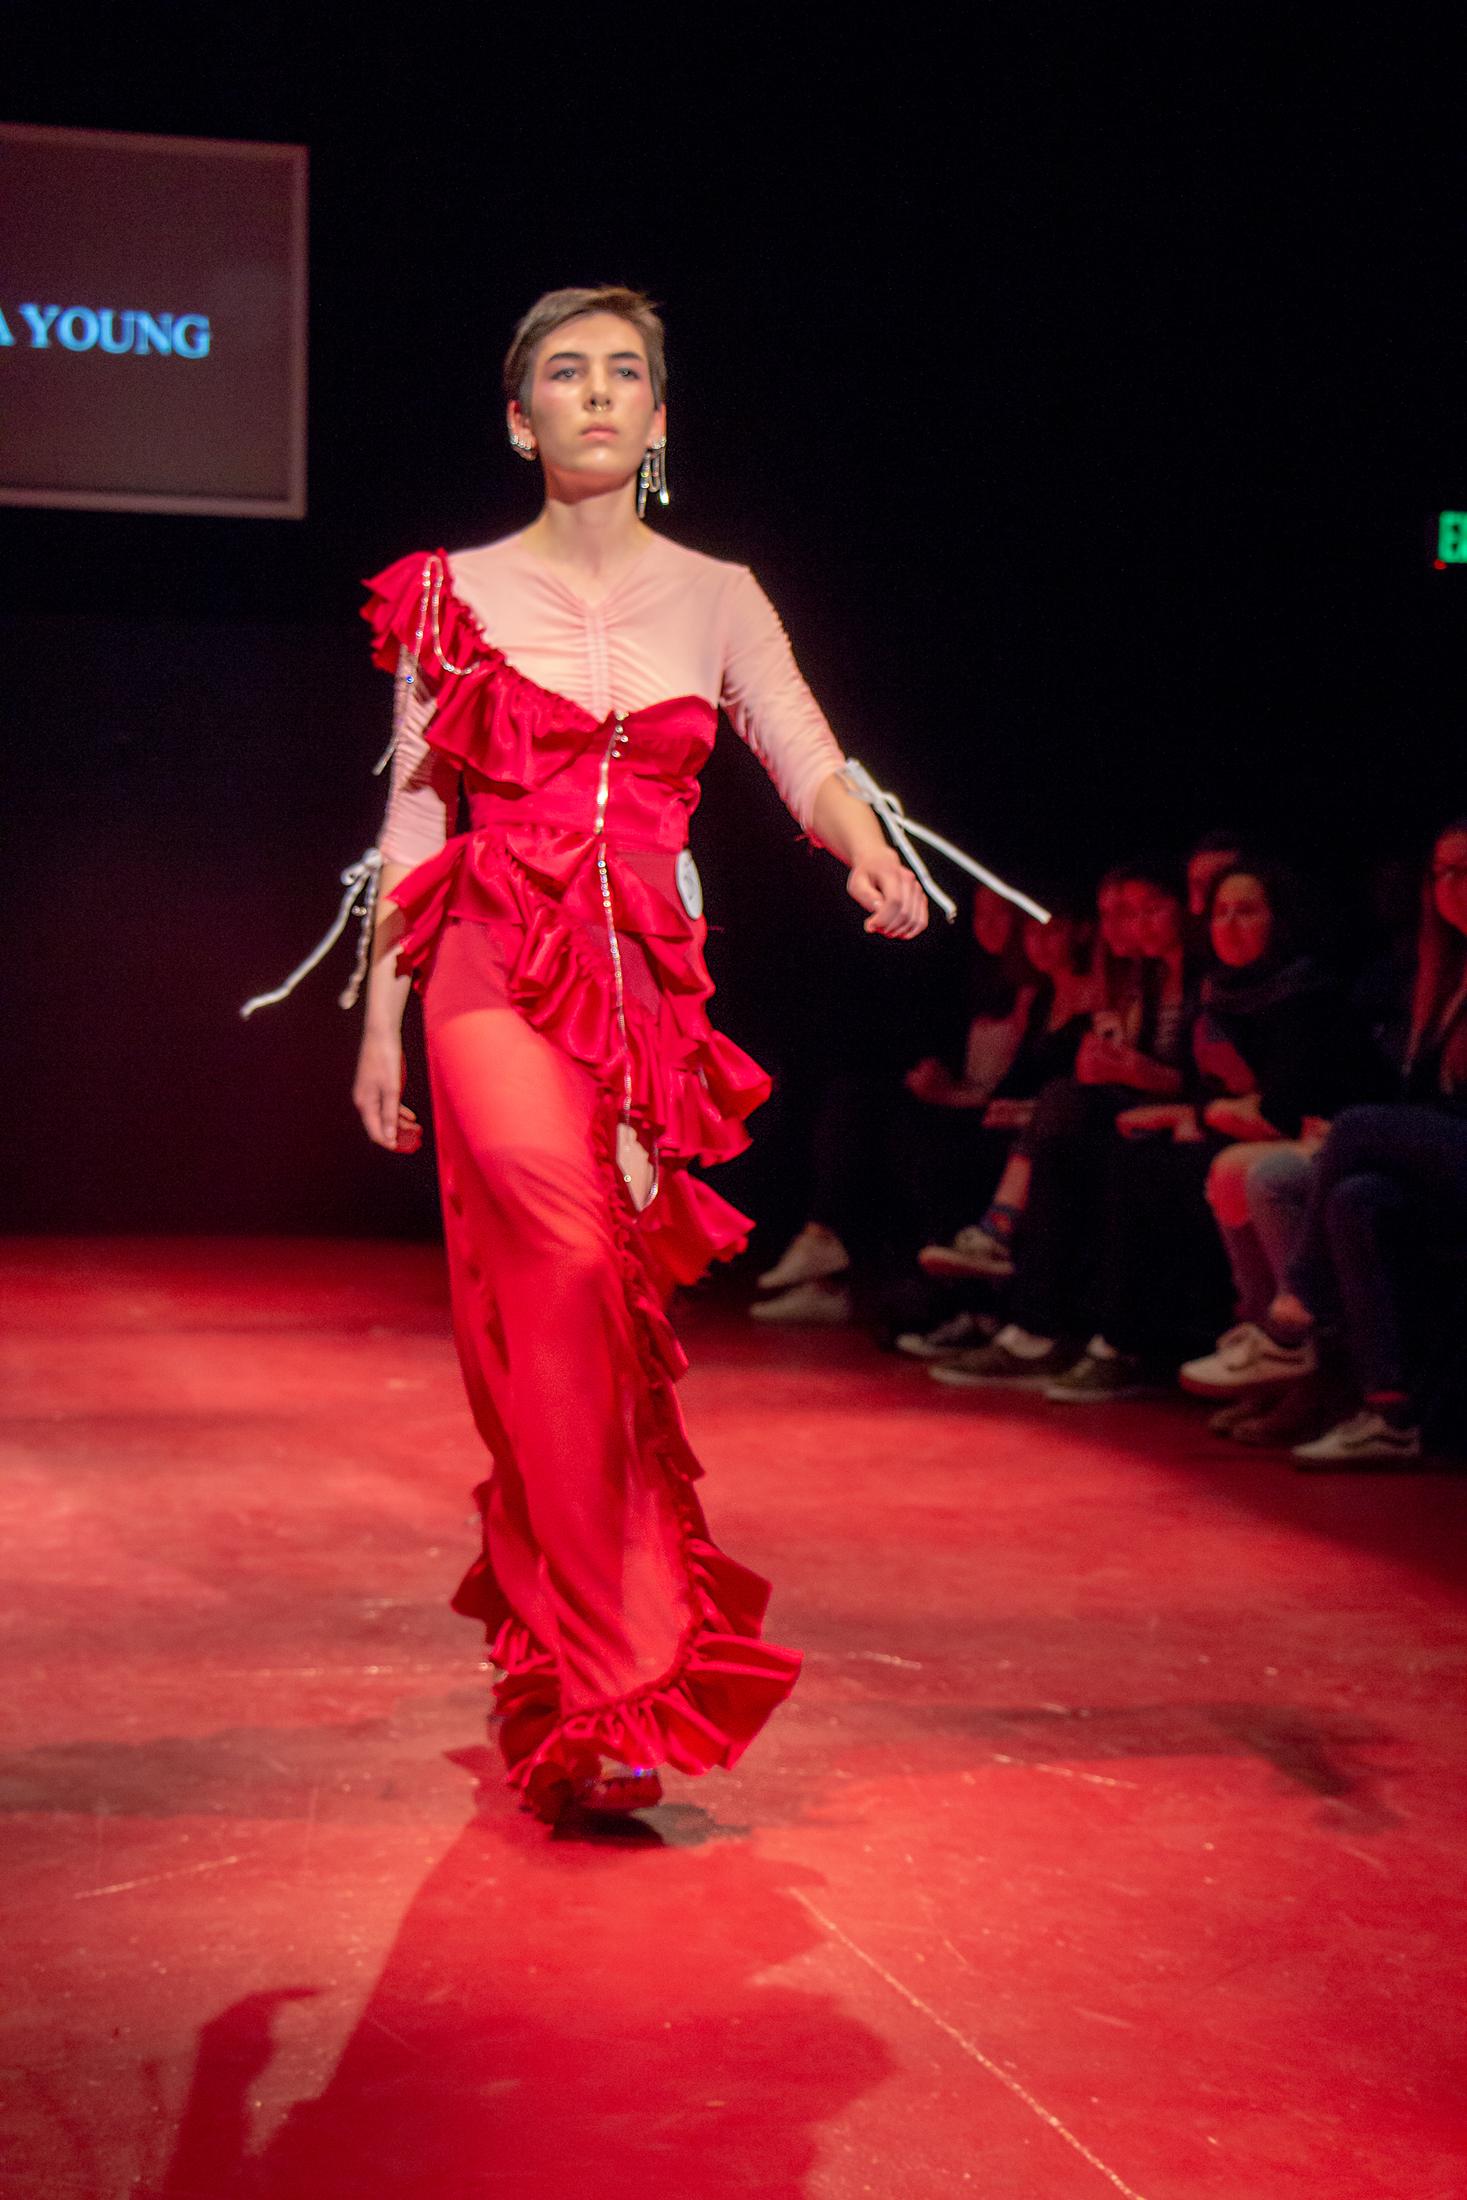 OSA-Fashion-Maya Young-PicGregGutbezahl-017.jpg